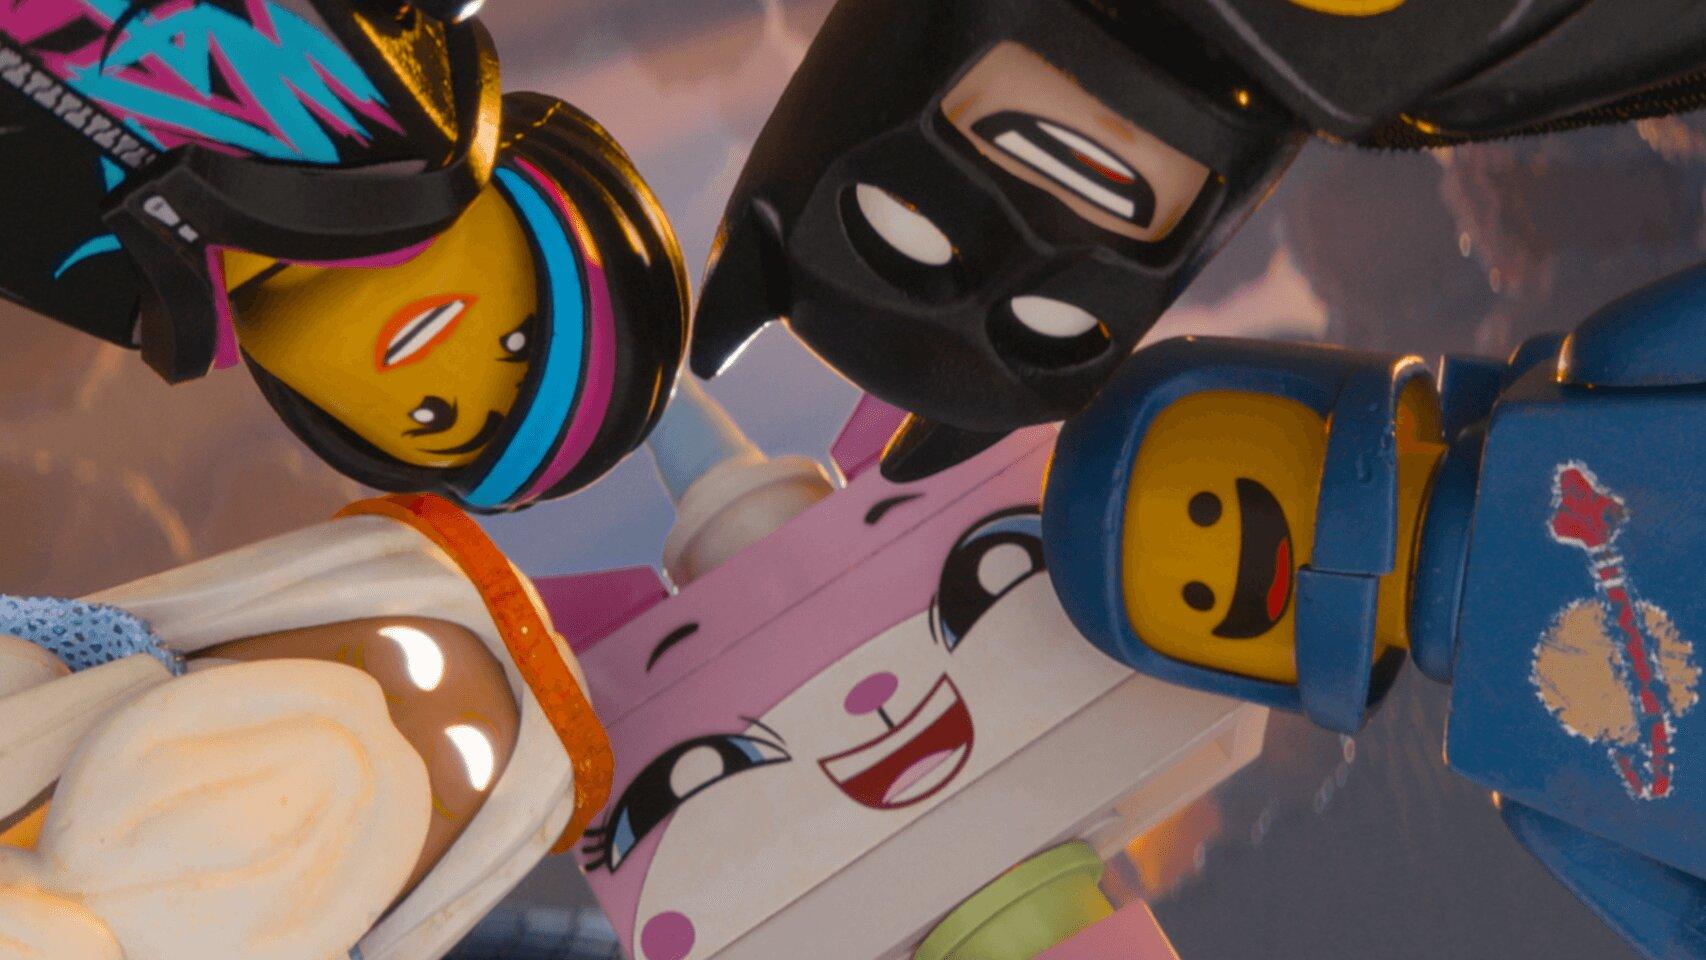 File:Lego-movie-13.jpg